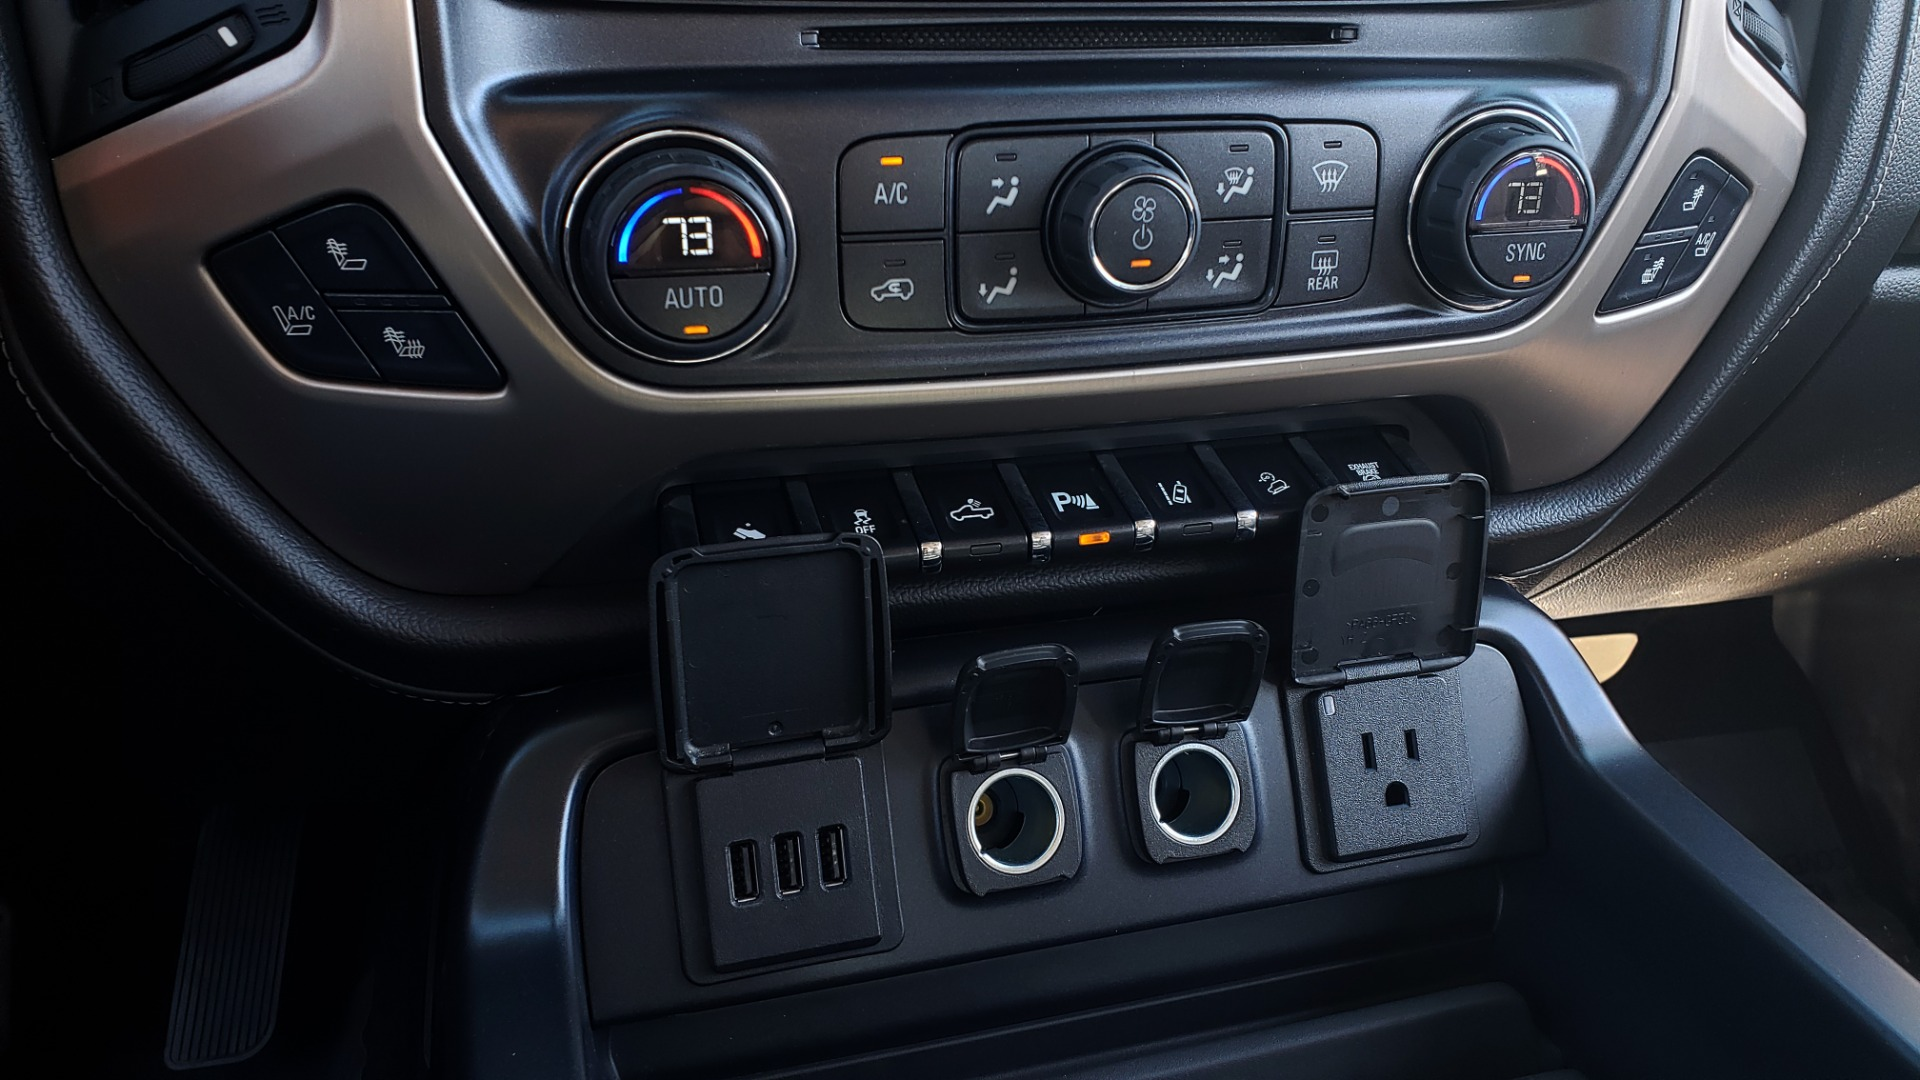 Used 2015 GMC SIERRA 2500HD DENALI 4WD CREWCAB / 6.6L DURAMAX / 6-SPD AUTO / NAV / BOSE for sale $50,995 at Formula Imports in Charlotte NC 28227 58